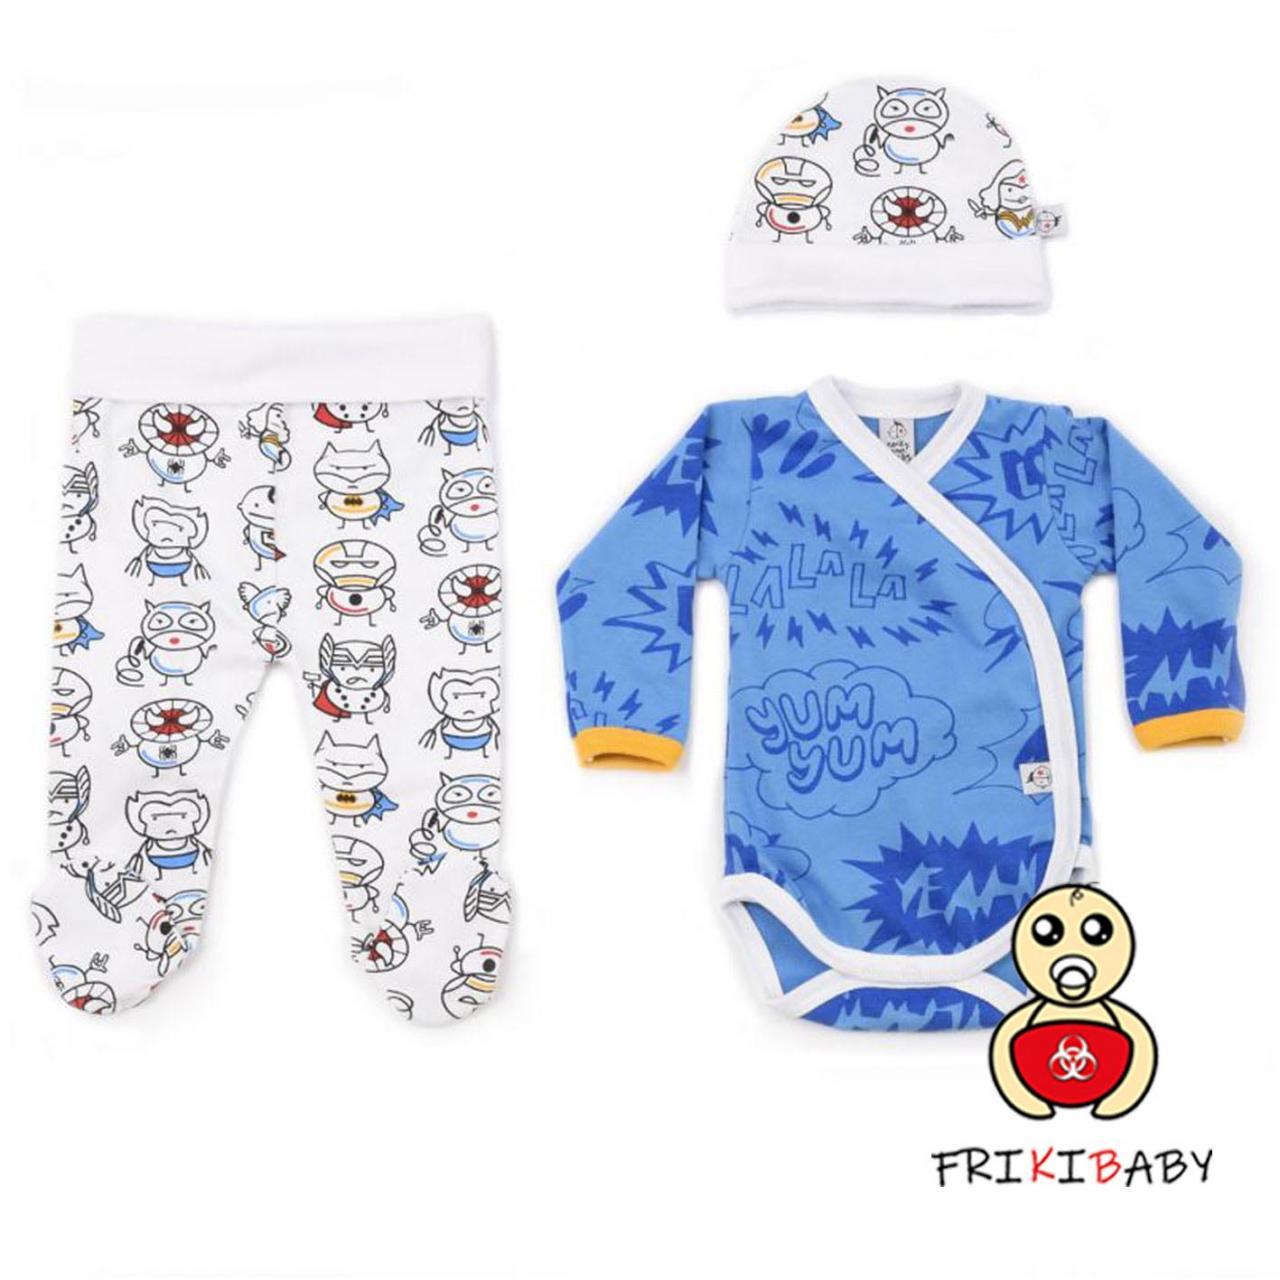 cosas frikis para bebés, ropita para bebe frikis, regalos frikis bebés, bebé friki, bodys para bebes originales